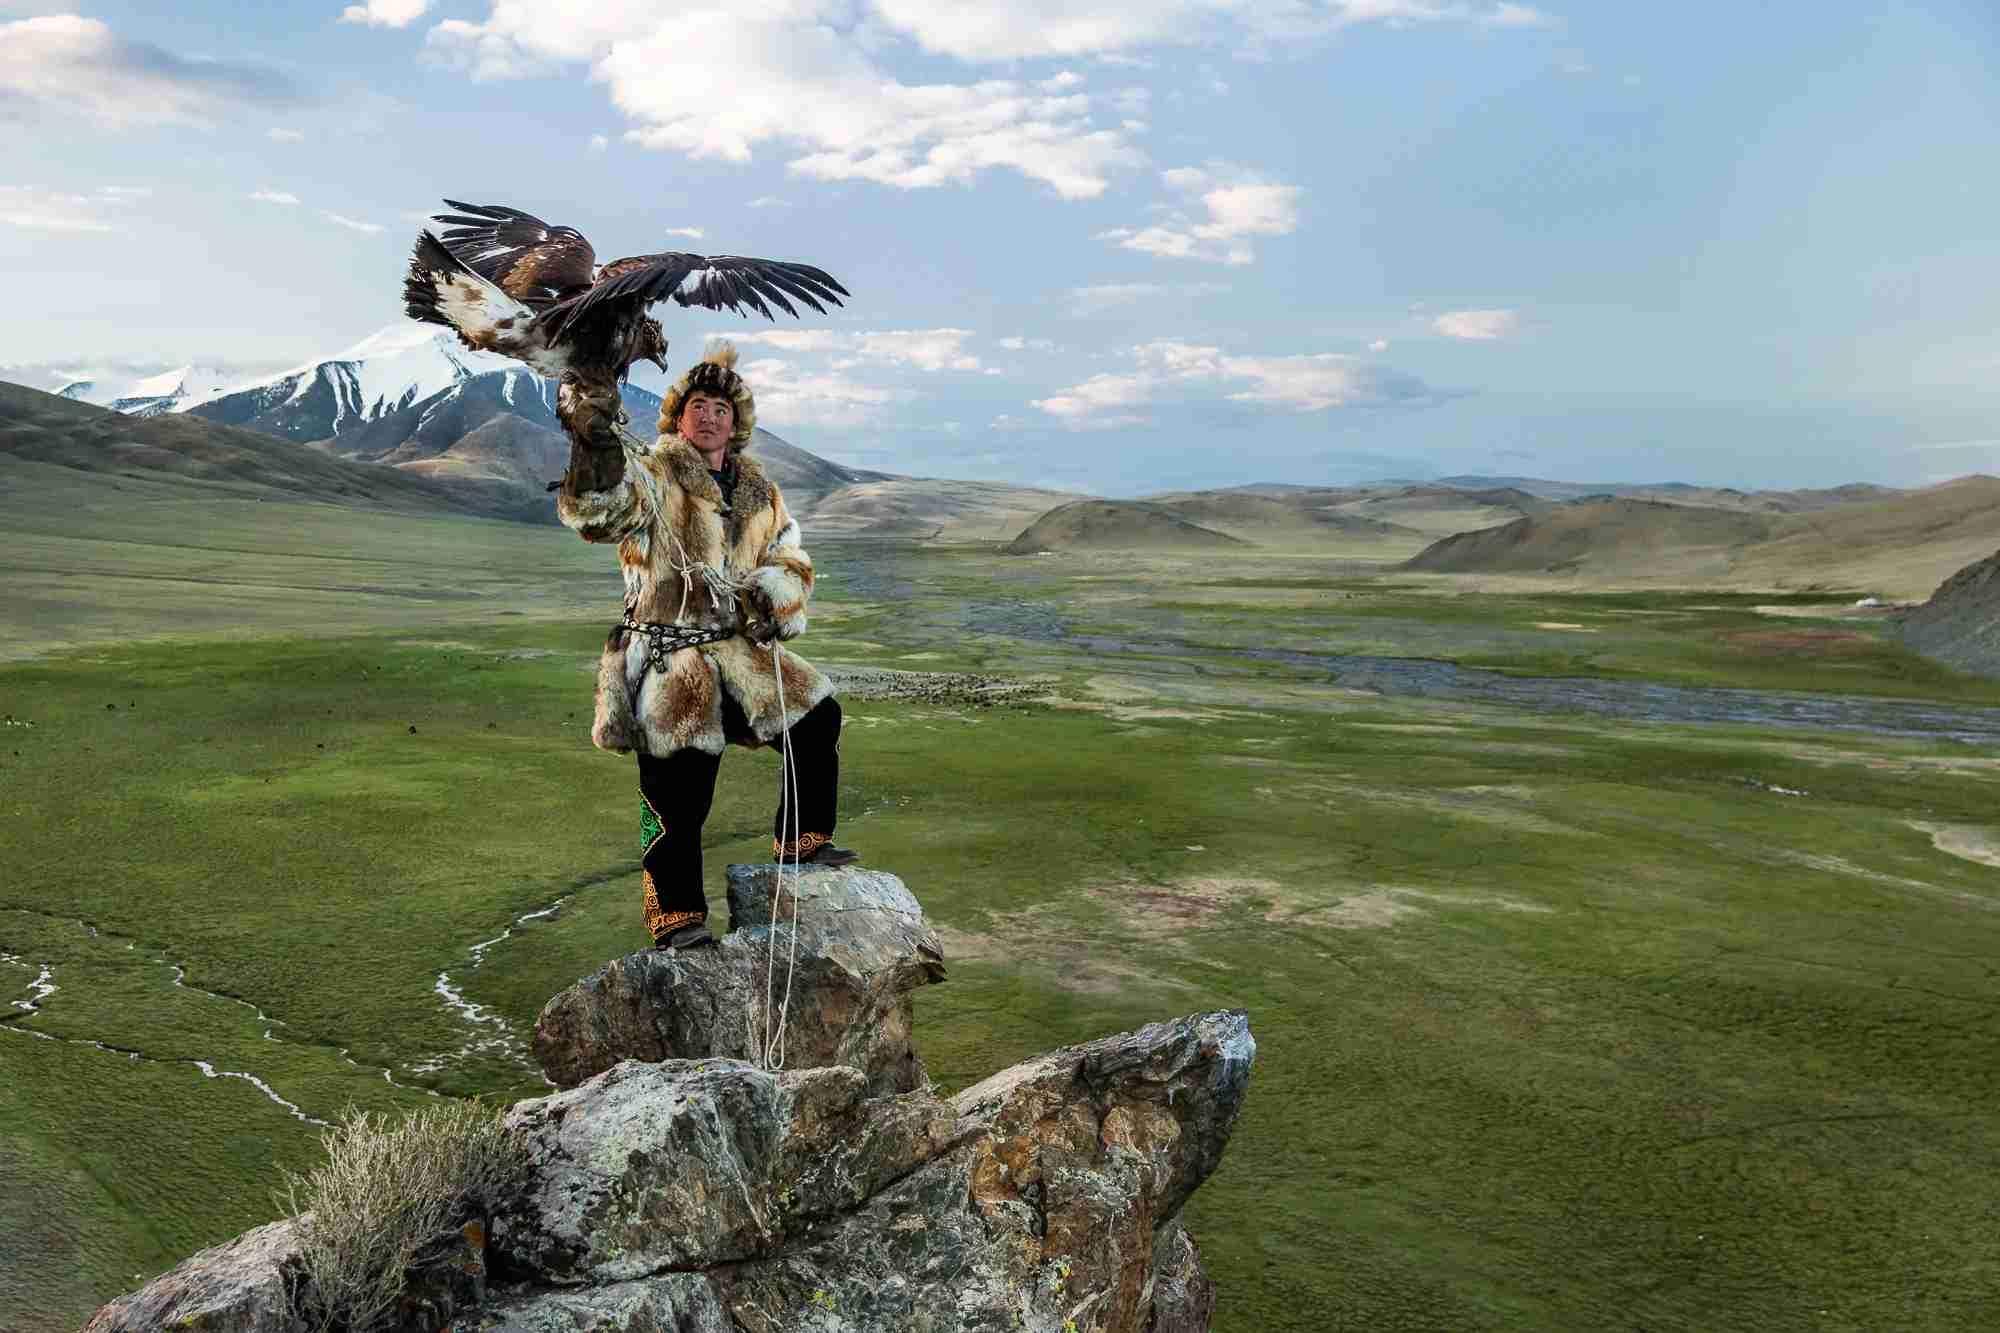 ALTAI MOUNTAIN RANGE, MONGOLIA - 14 JUNE 2015: Berik, one of Sailau